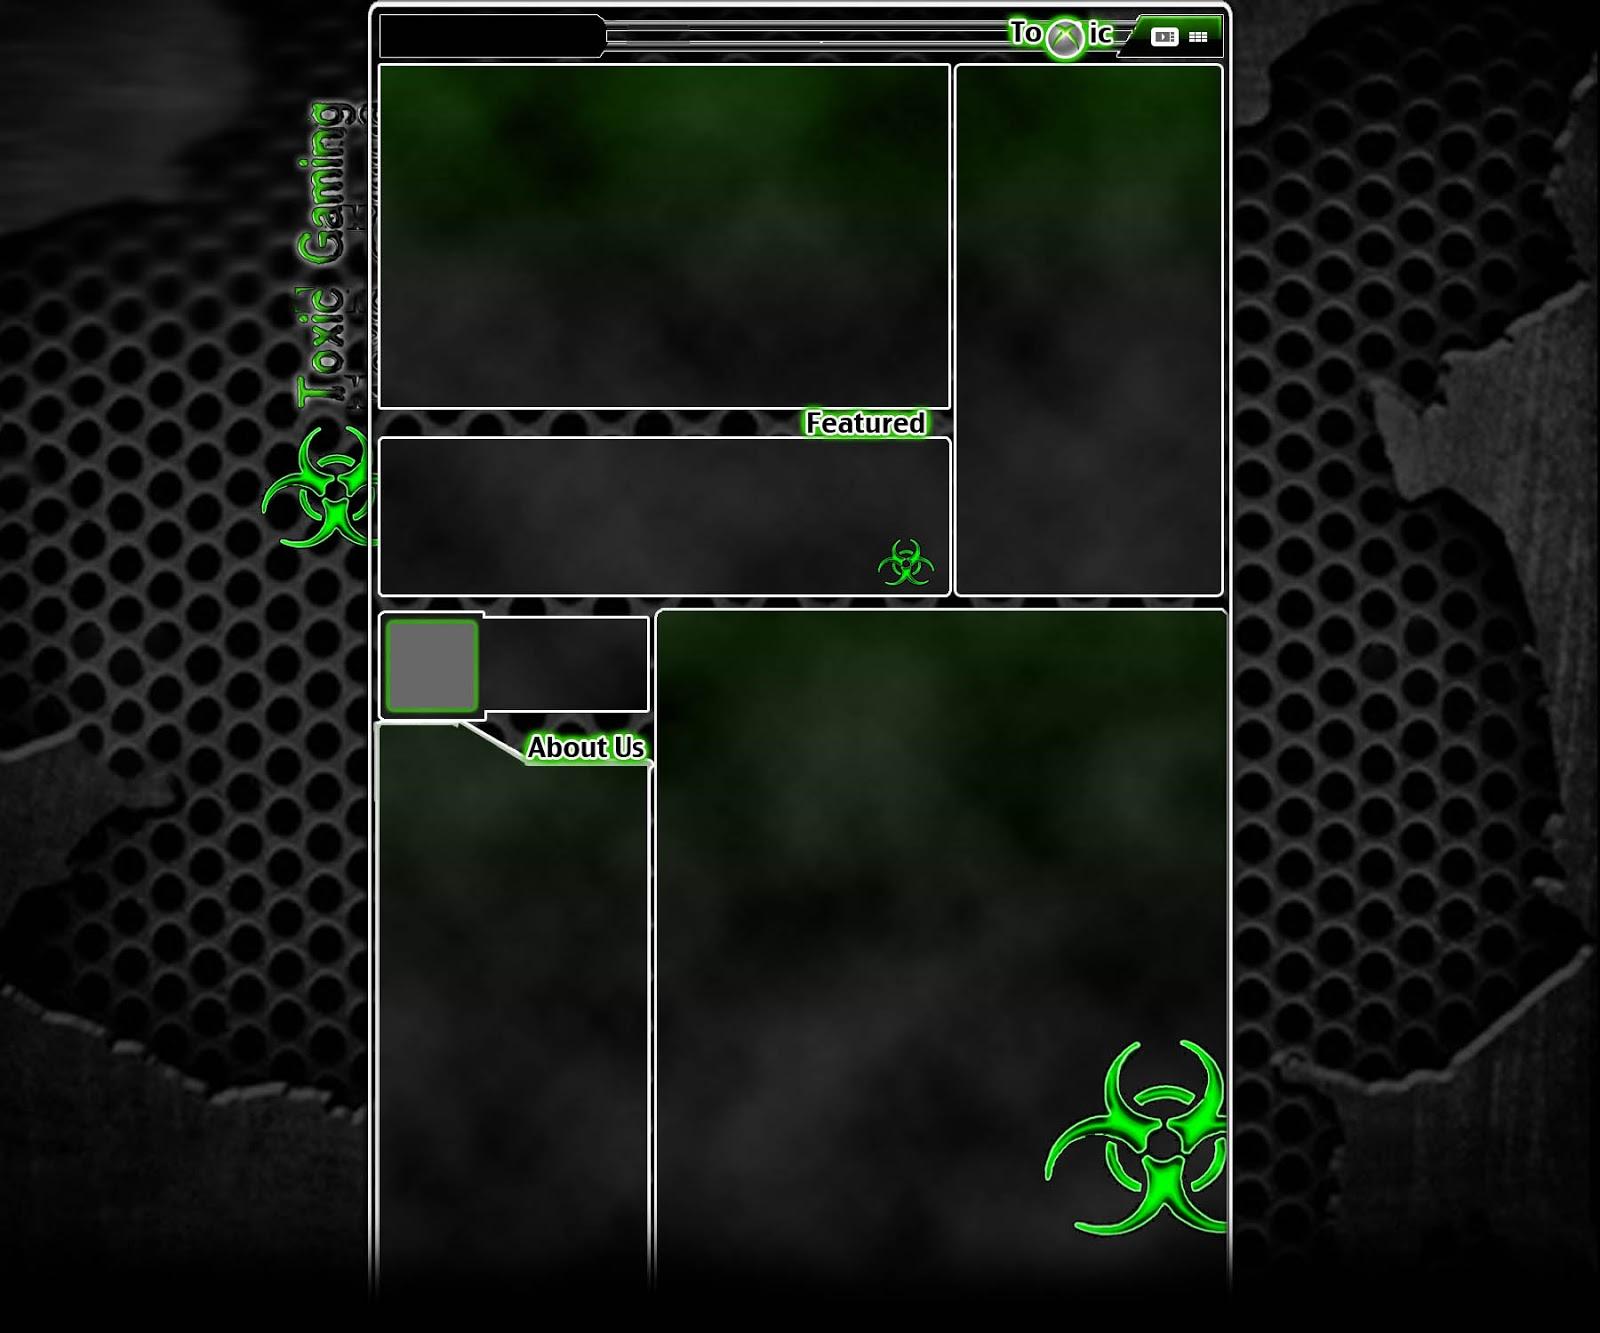 Gaming Wallpaper For Youtube Channel Wallpapersafari